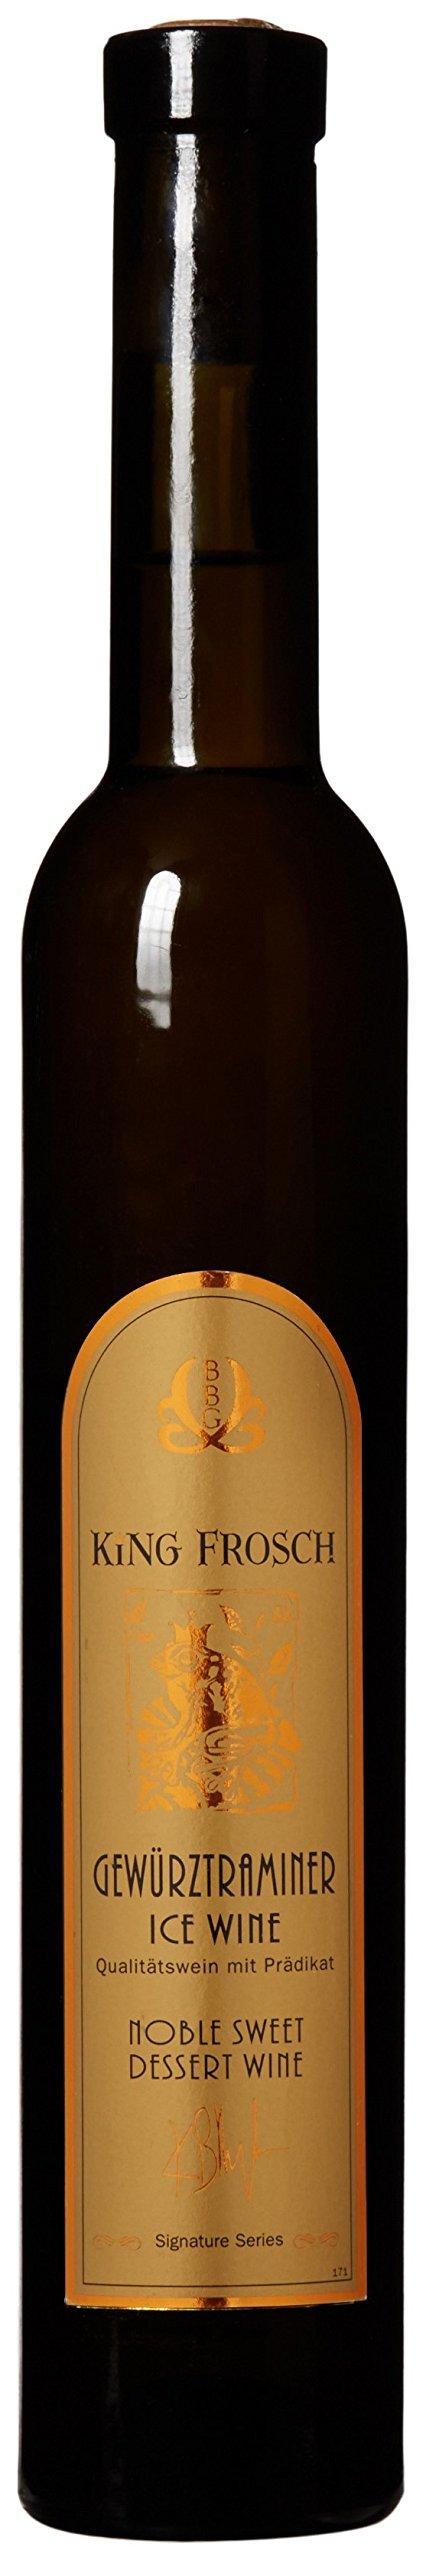 2002 King Frosch Gewürztraminer 375 mL All Natural German Dessert Wine